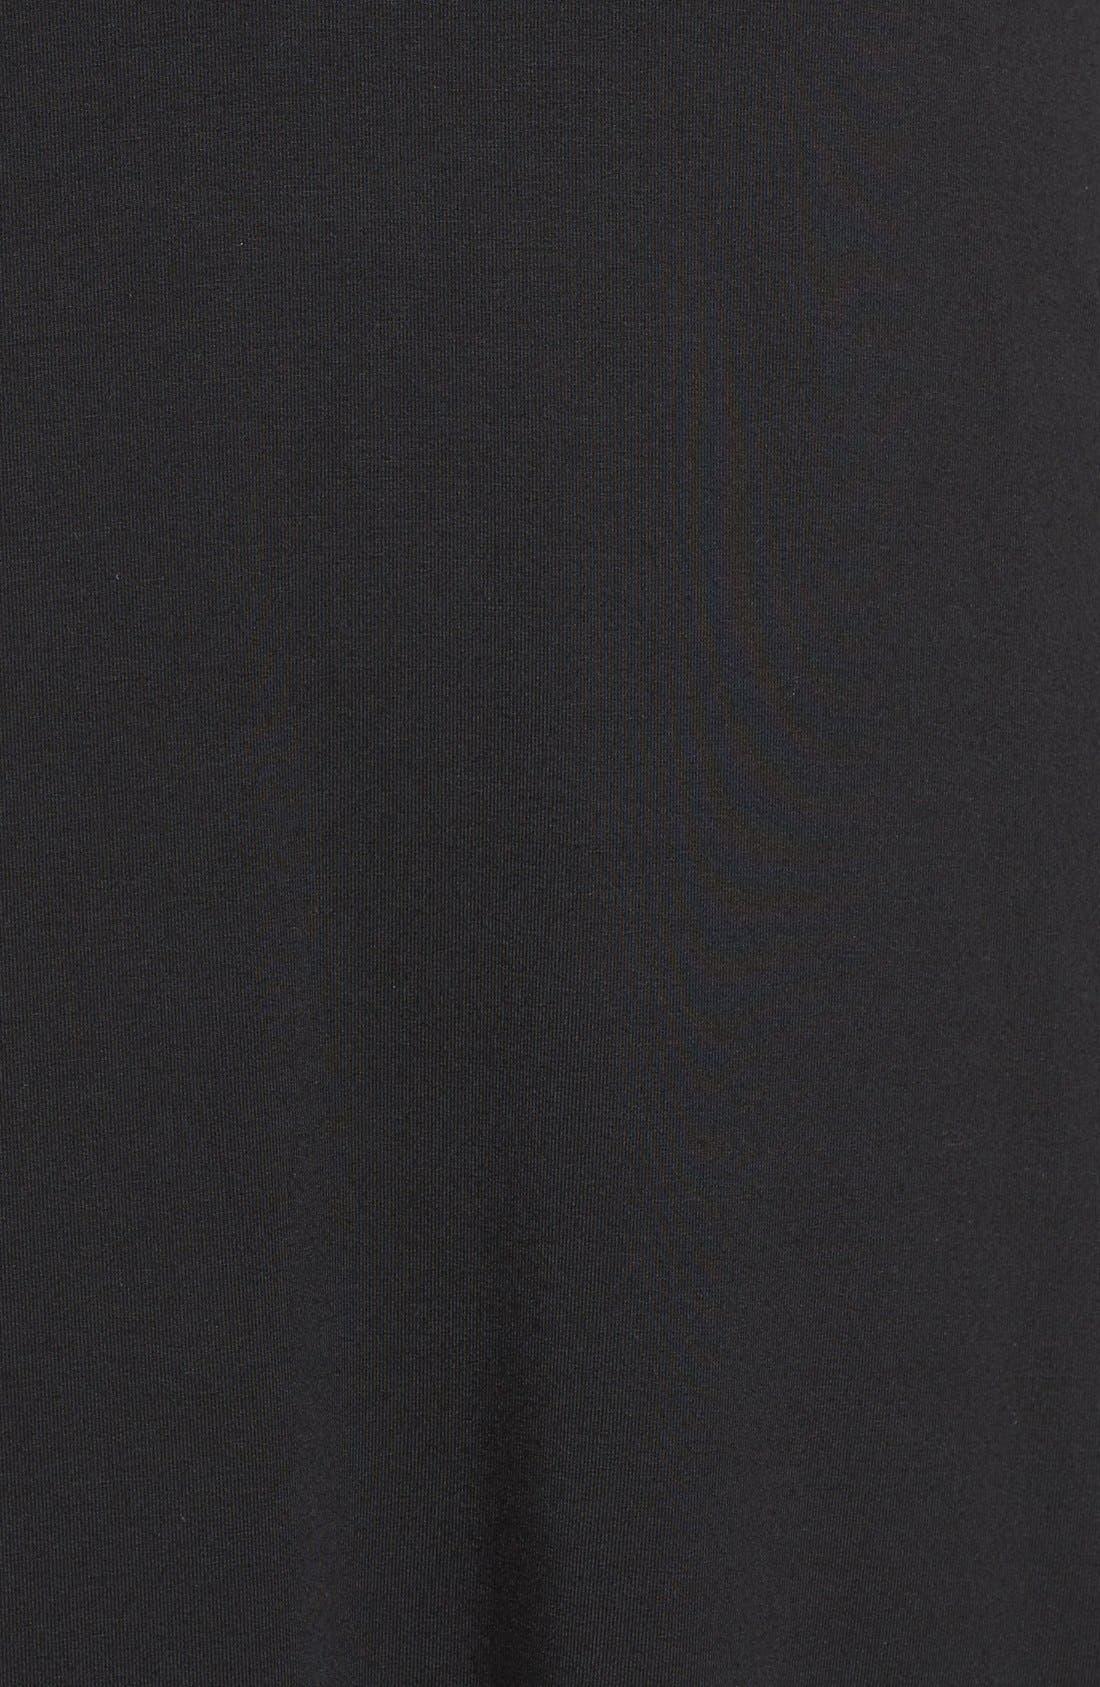 Sally Turtleneck A-Line Dress,                             Alternate thumbnail 10, color,                             001